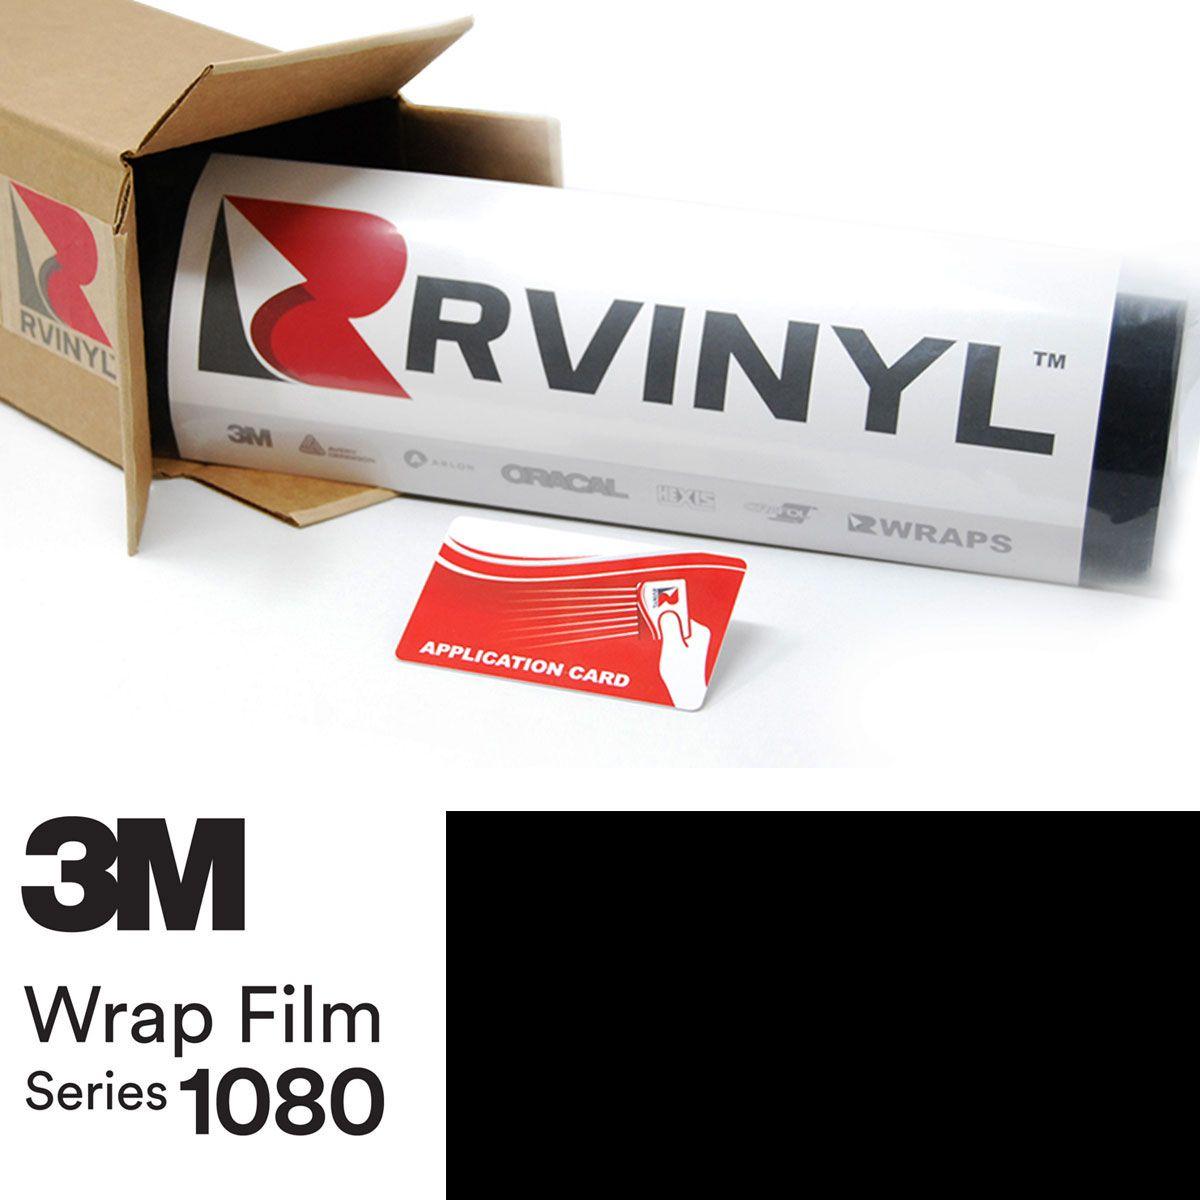 3M™ Wrap Film Series 1080 - Gloss Black | Truck | Car wrap